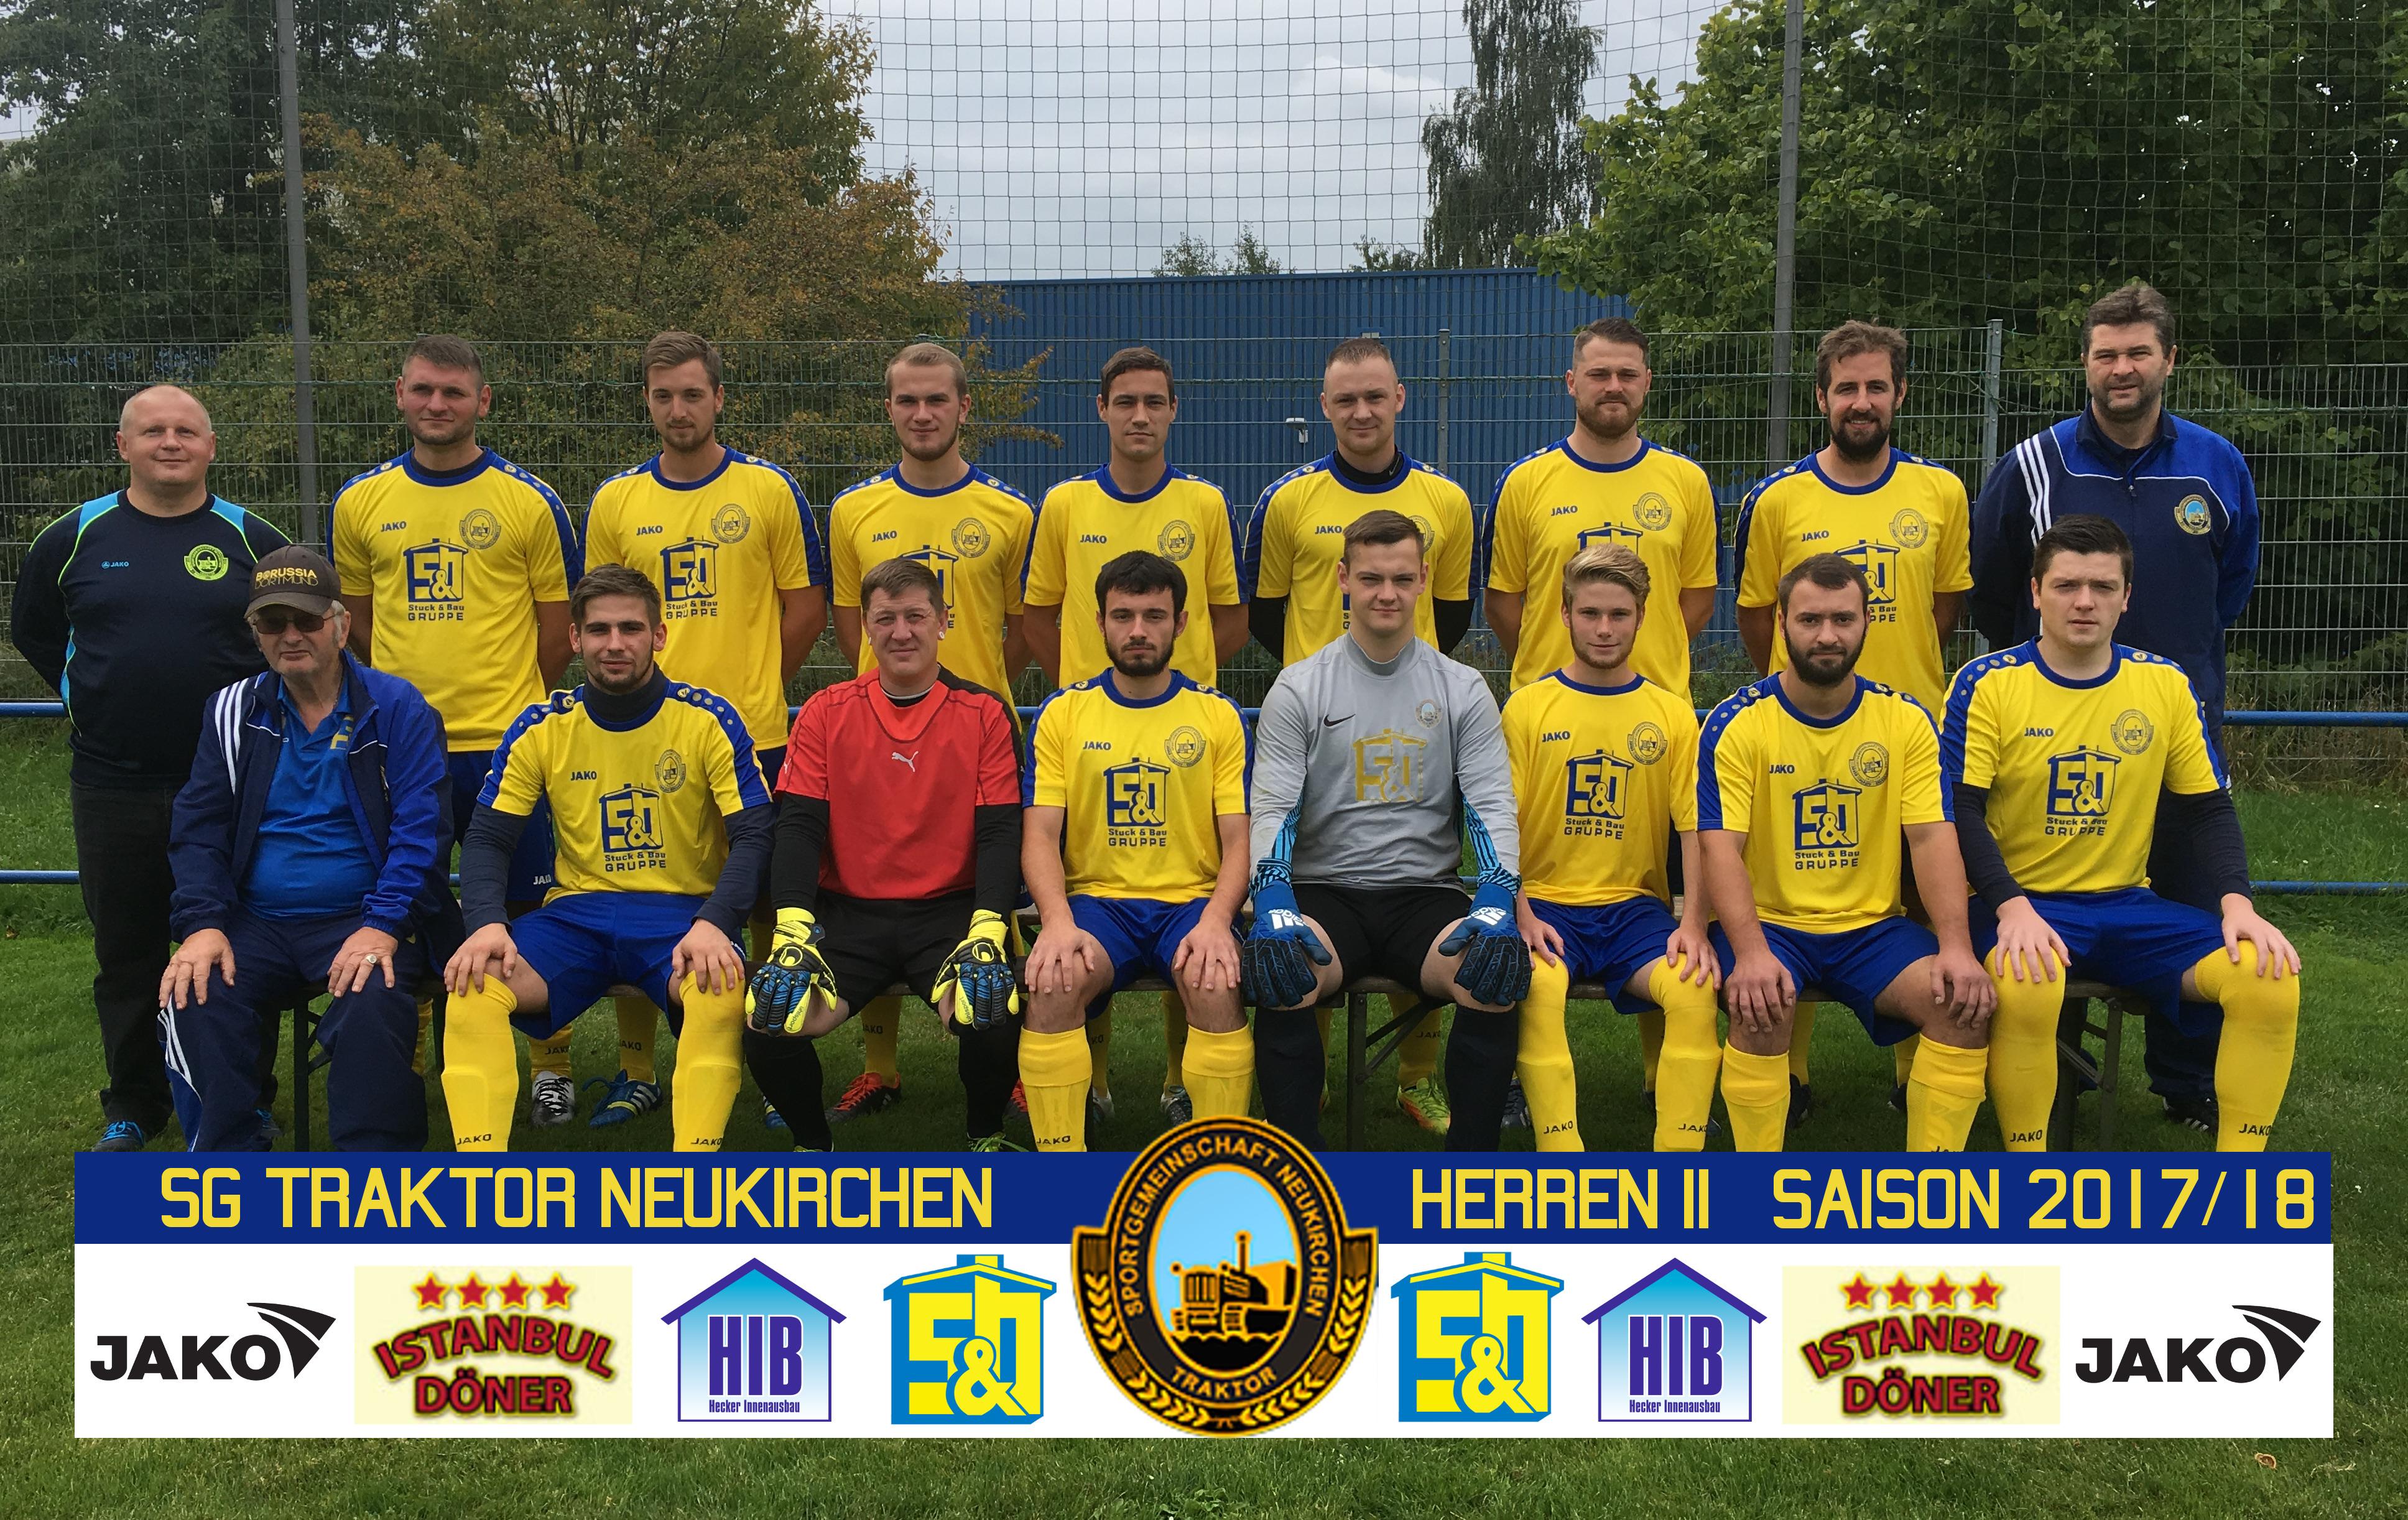 SGN Herren ll 2017/18